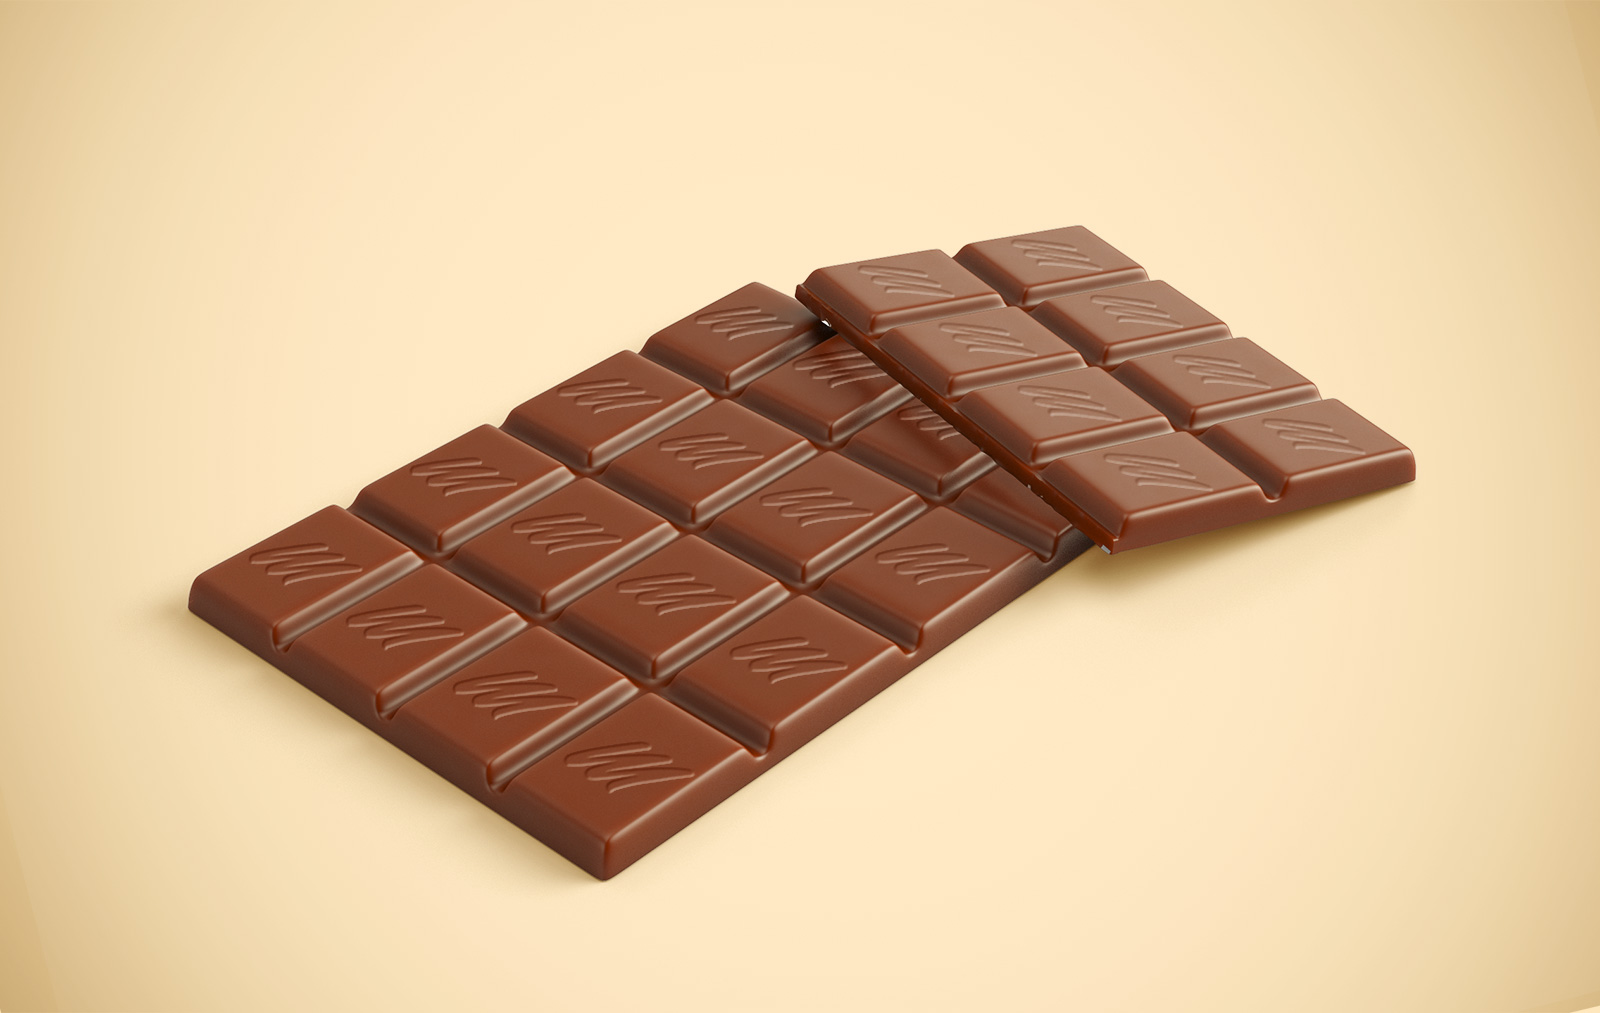 Free-Chocolate-Bar-Packaging-Mockup-PSD-2